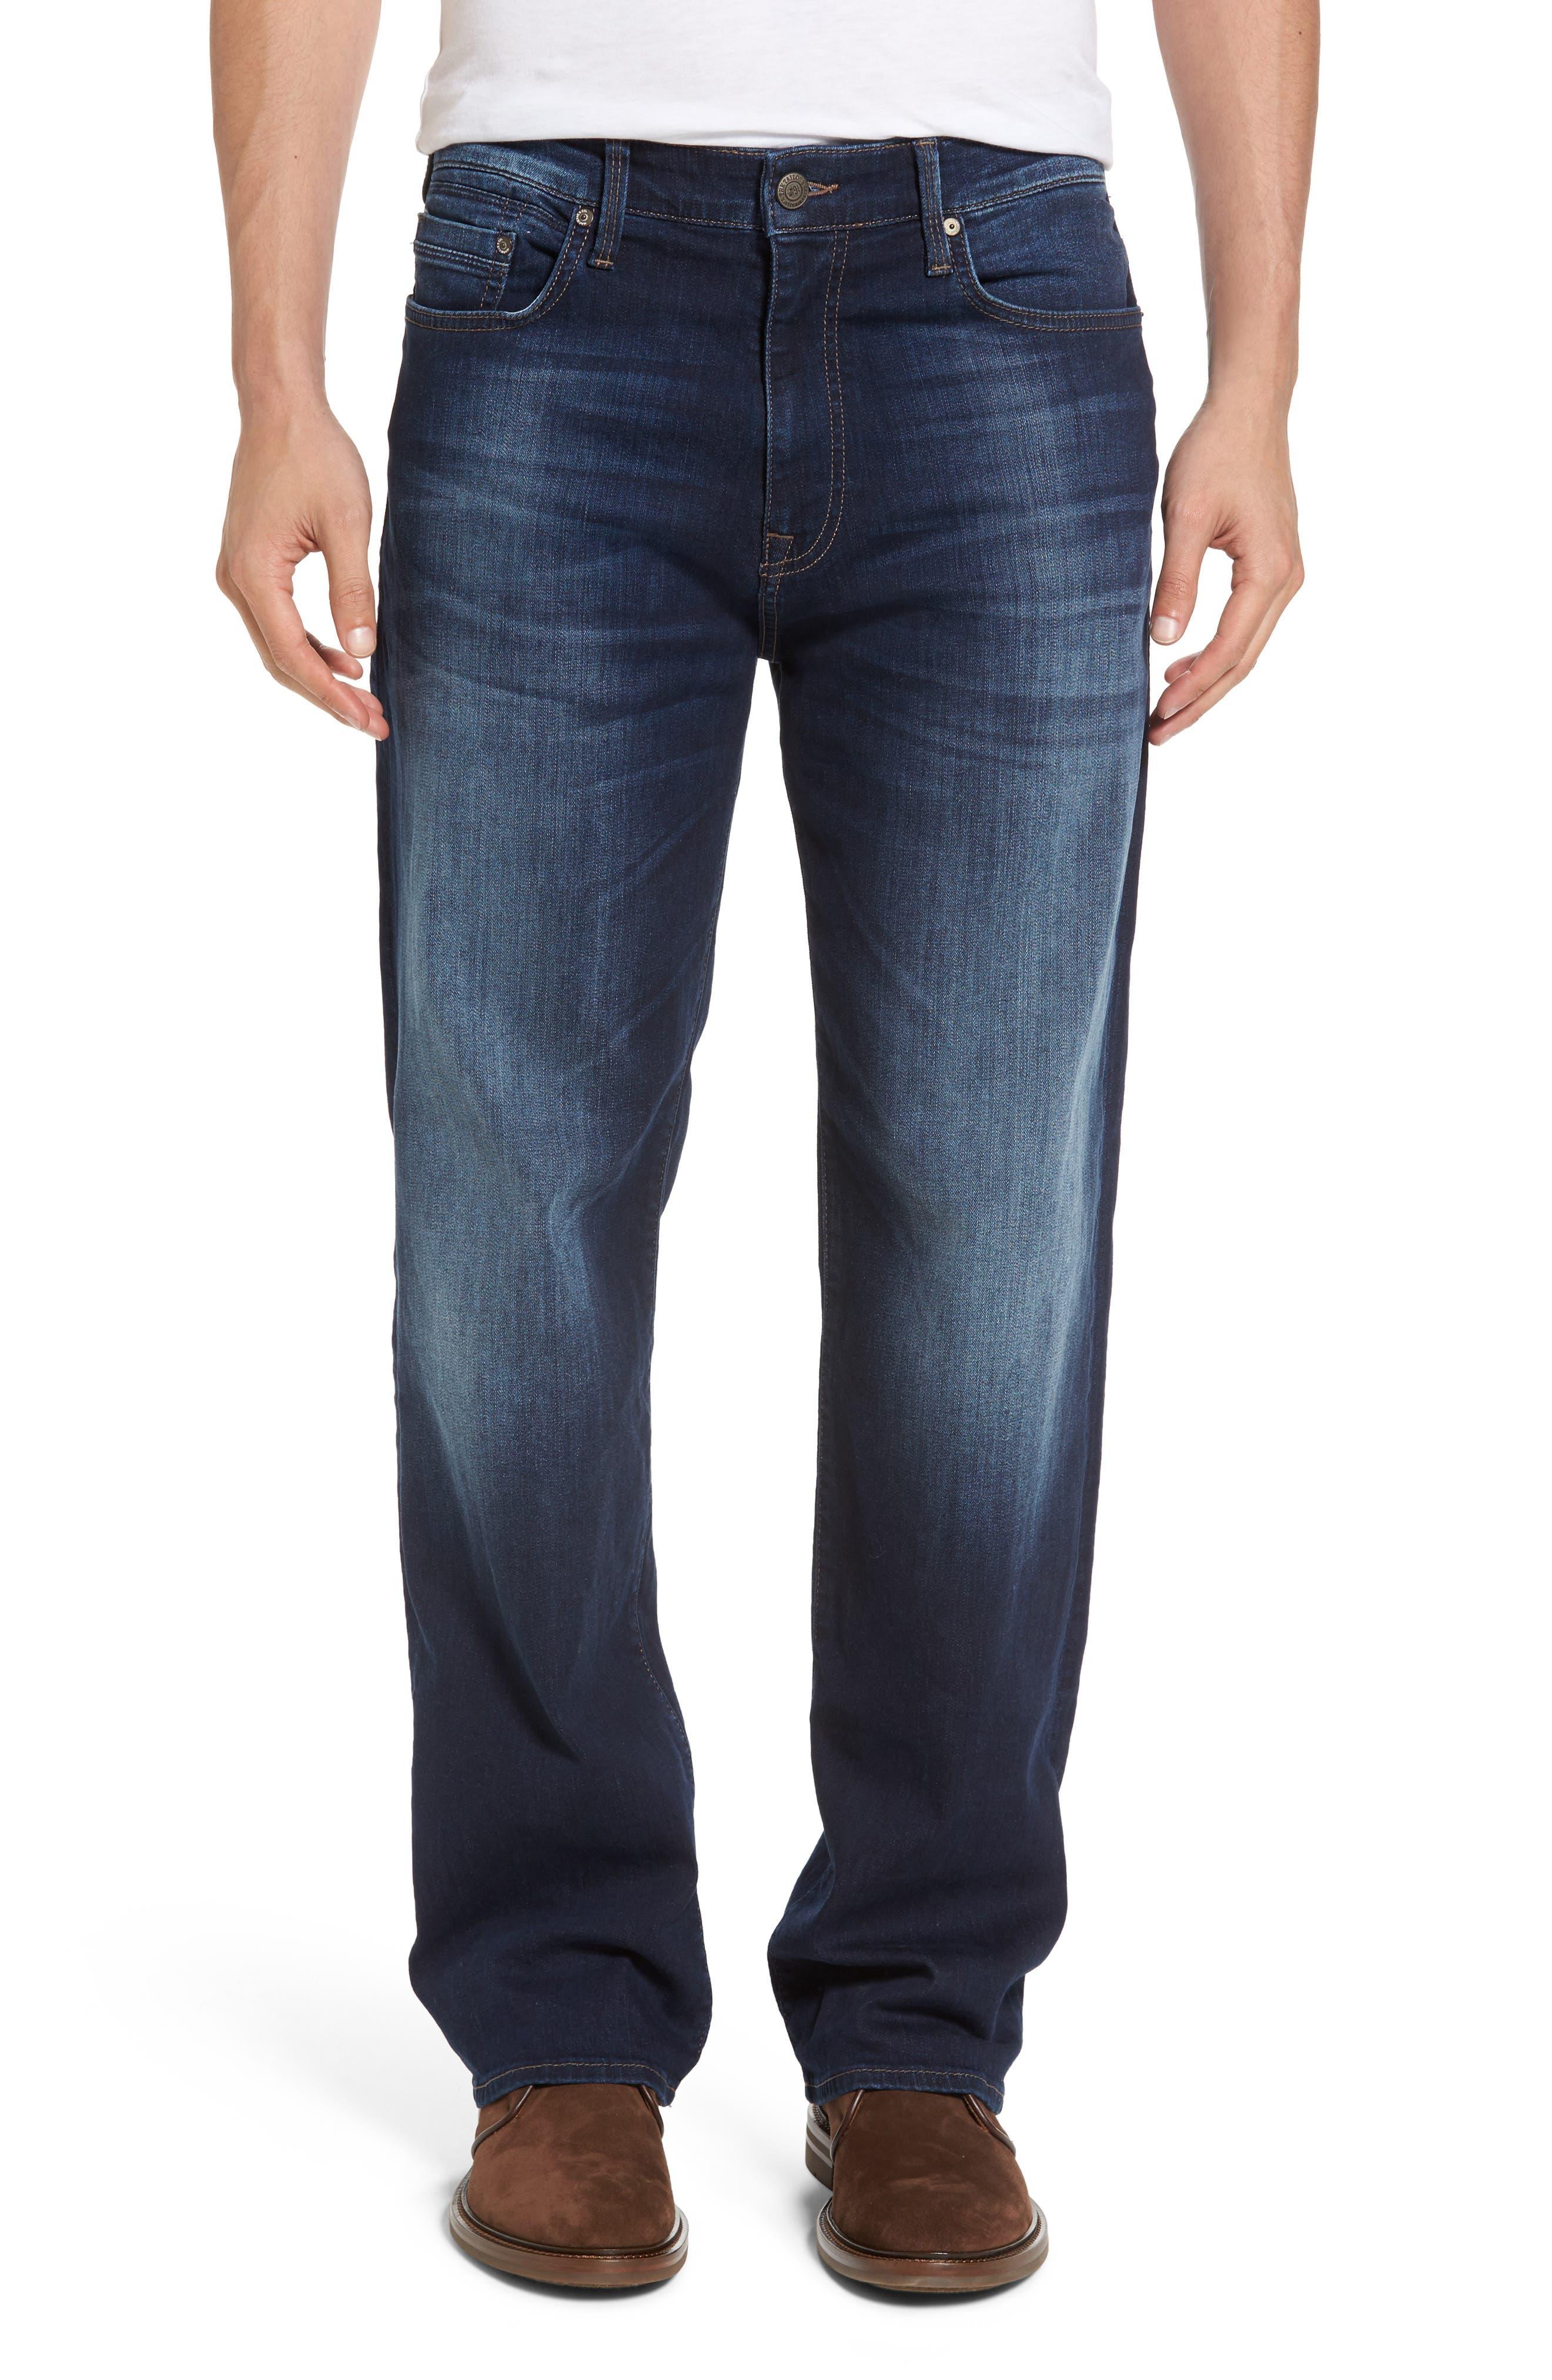 Main Image - Mavi Jeans 'Max' Relaxed Fit Jeans (Dark Williamsburg)